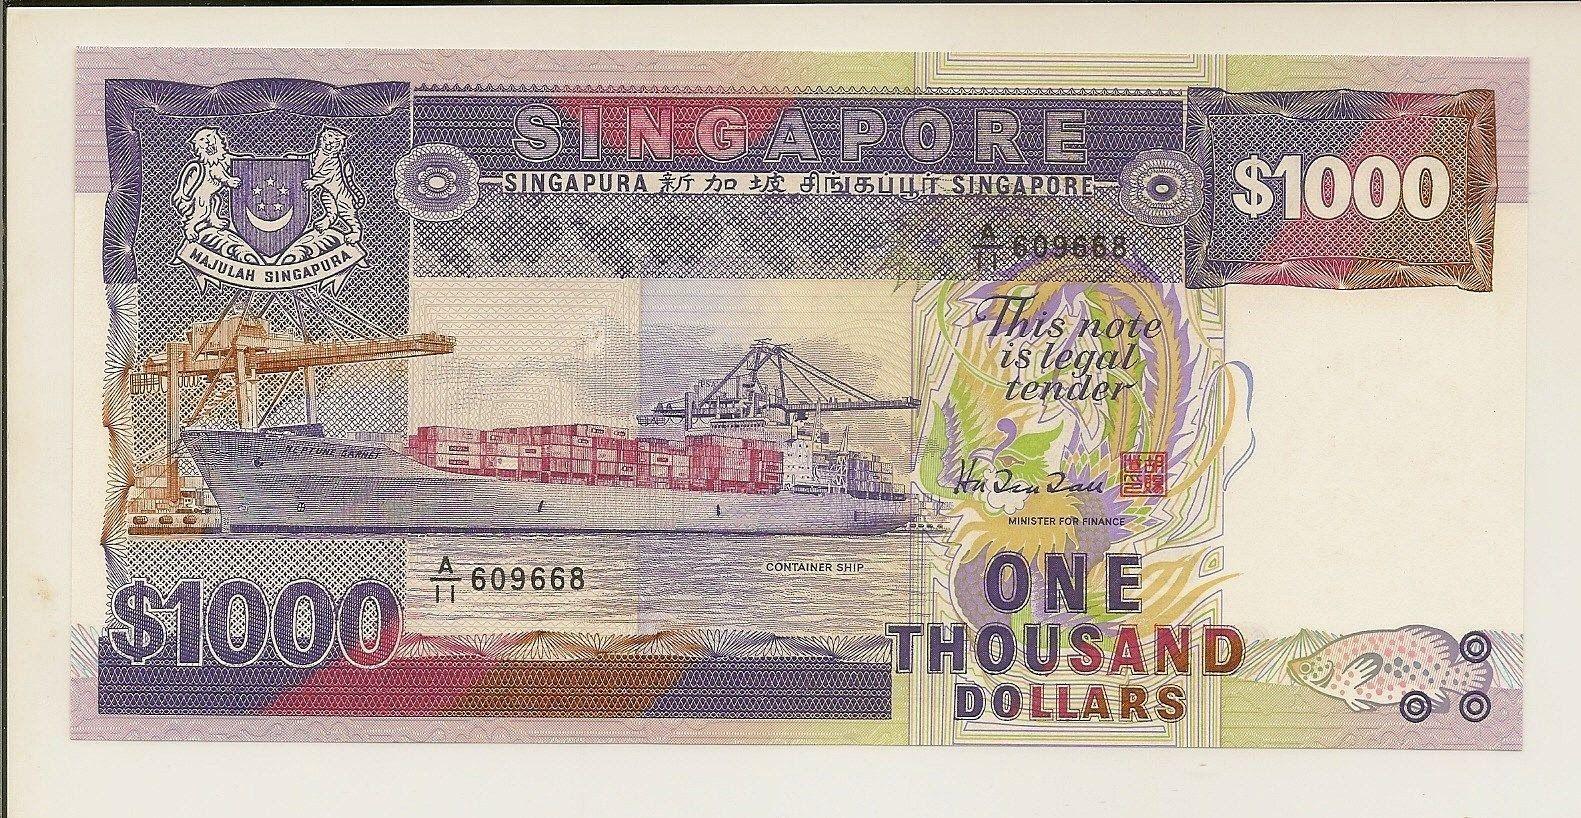 Singapore Banknotes 1000 Dollars Banknote Ship Series Container Ship Neptune Garnet Dollar Banknote Bank Notes Dollar